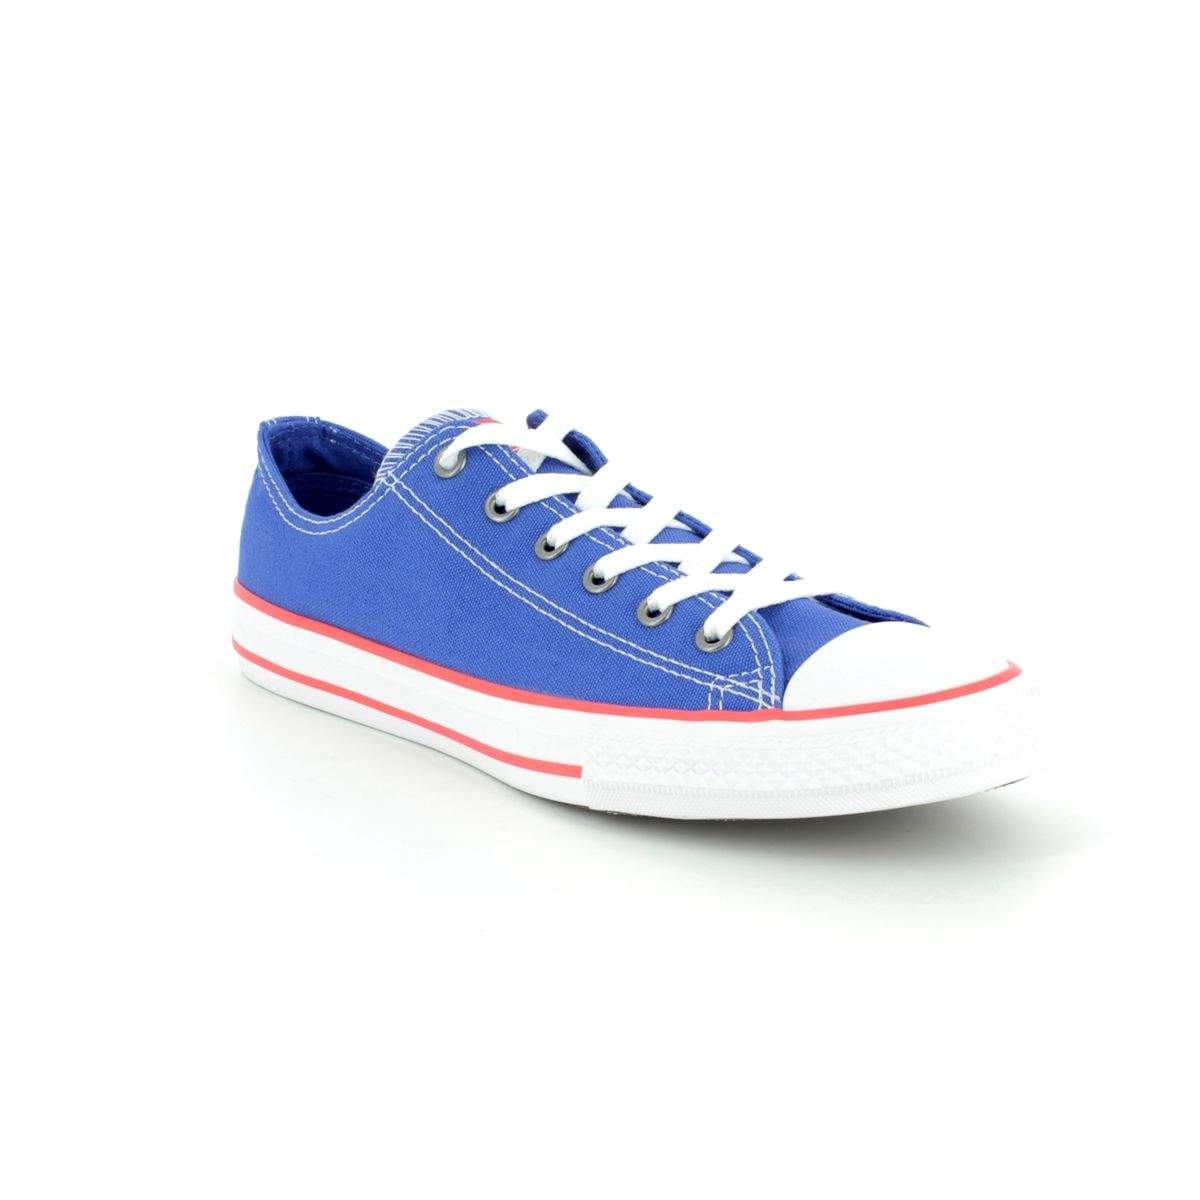 a67871ff5875 Converse Trainers - Blue multi - 660104C ALL STAR OX JUNIOR